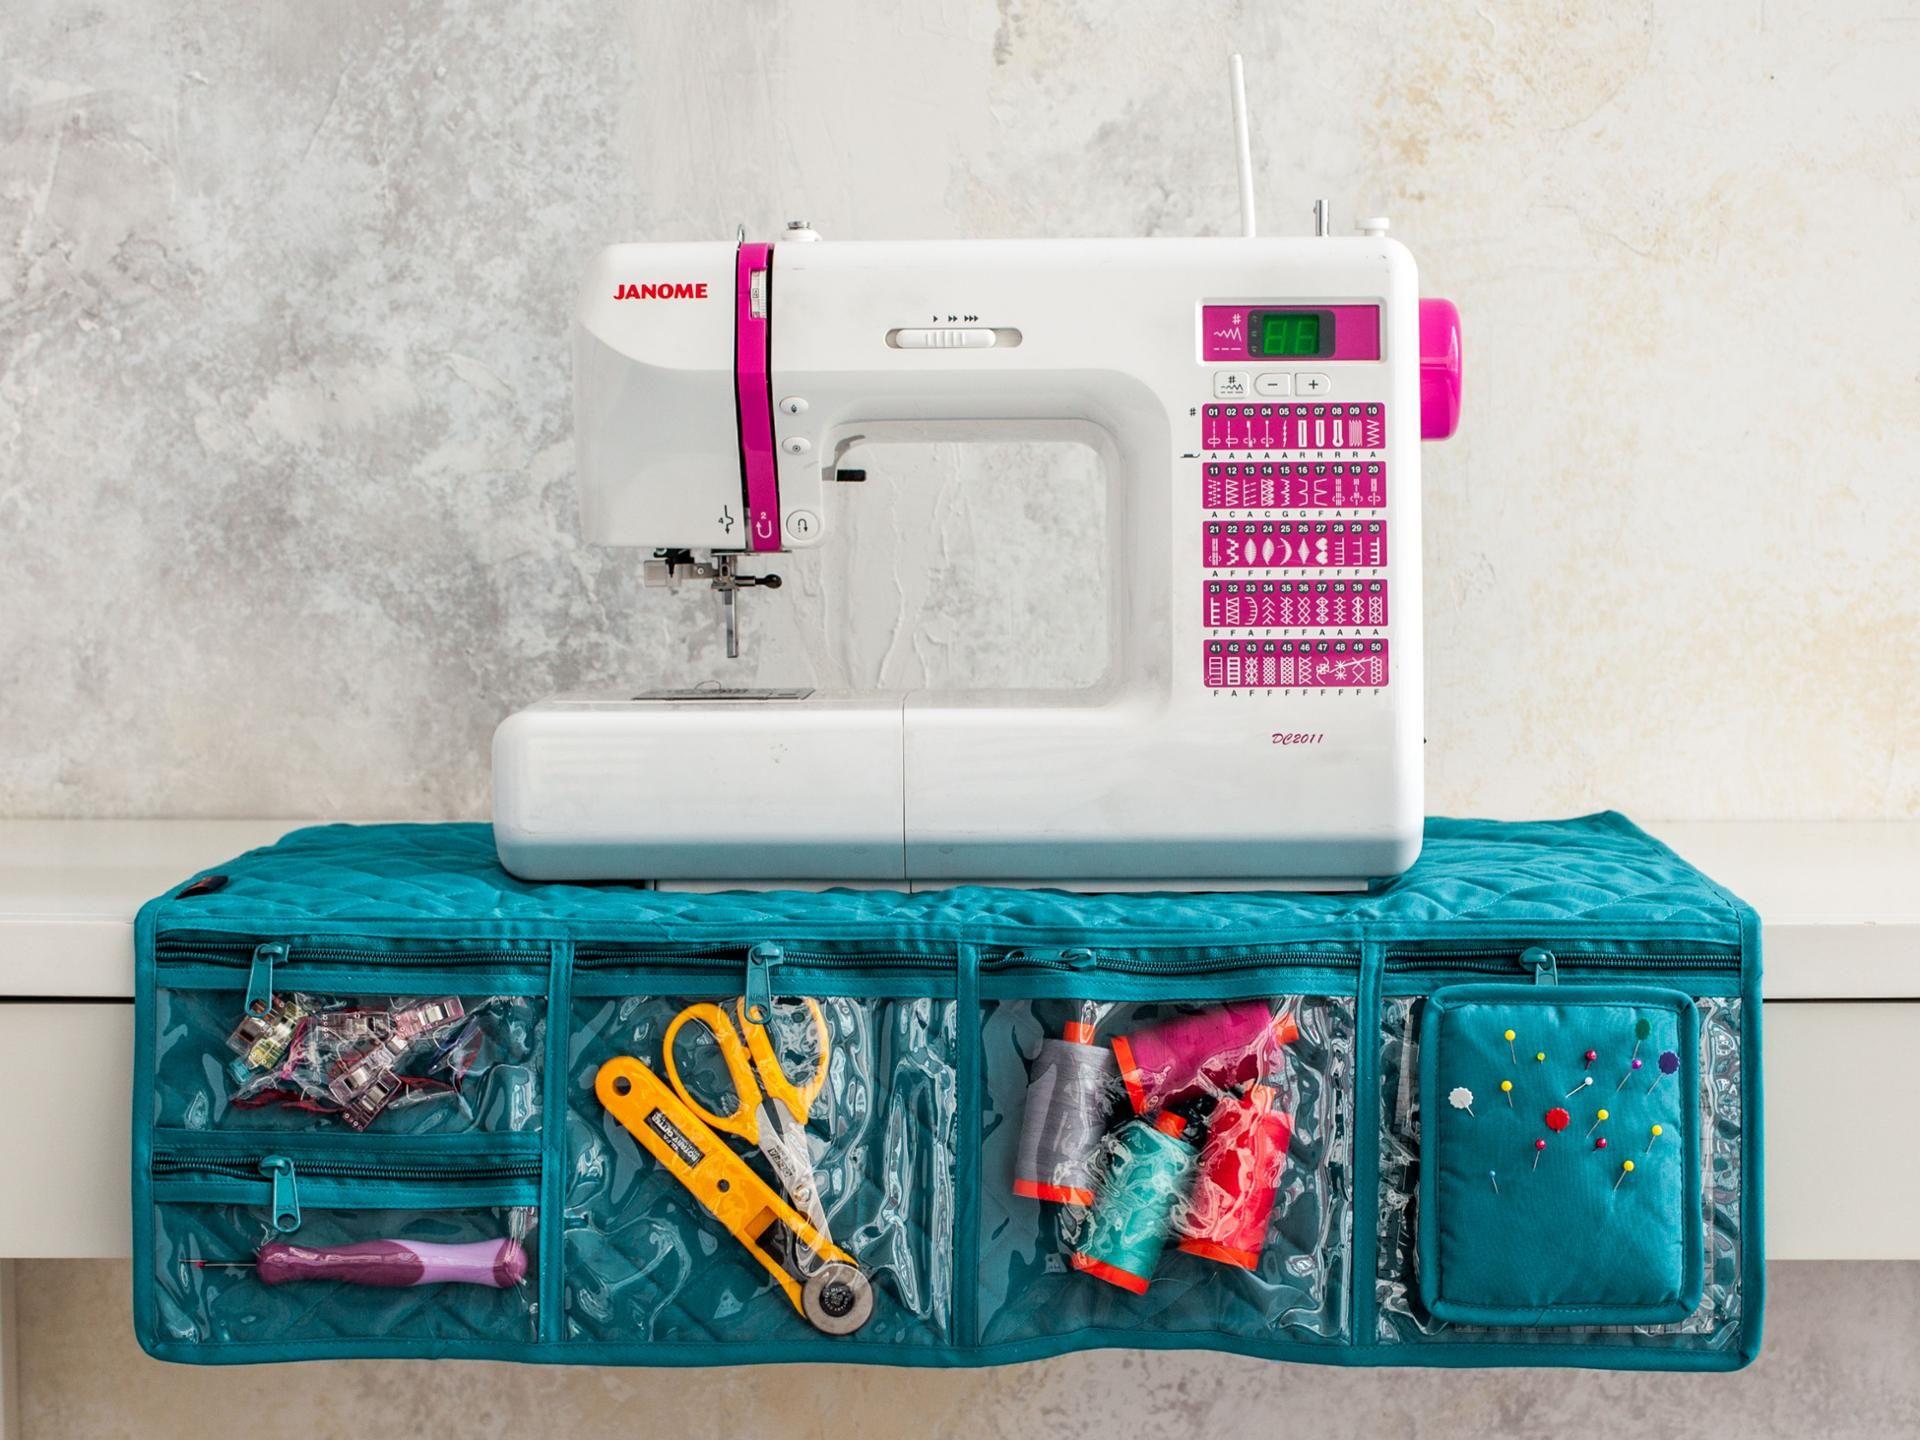 Yazzii Sewing Machine Mat | Sewing machine accessories